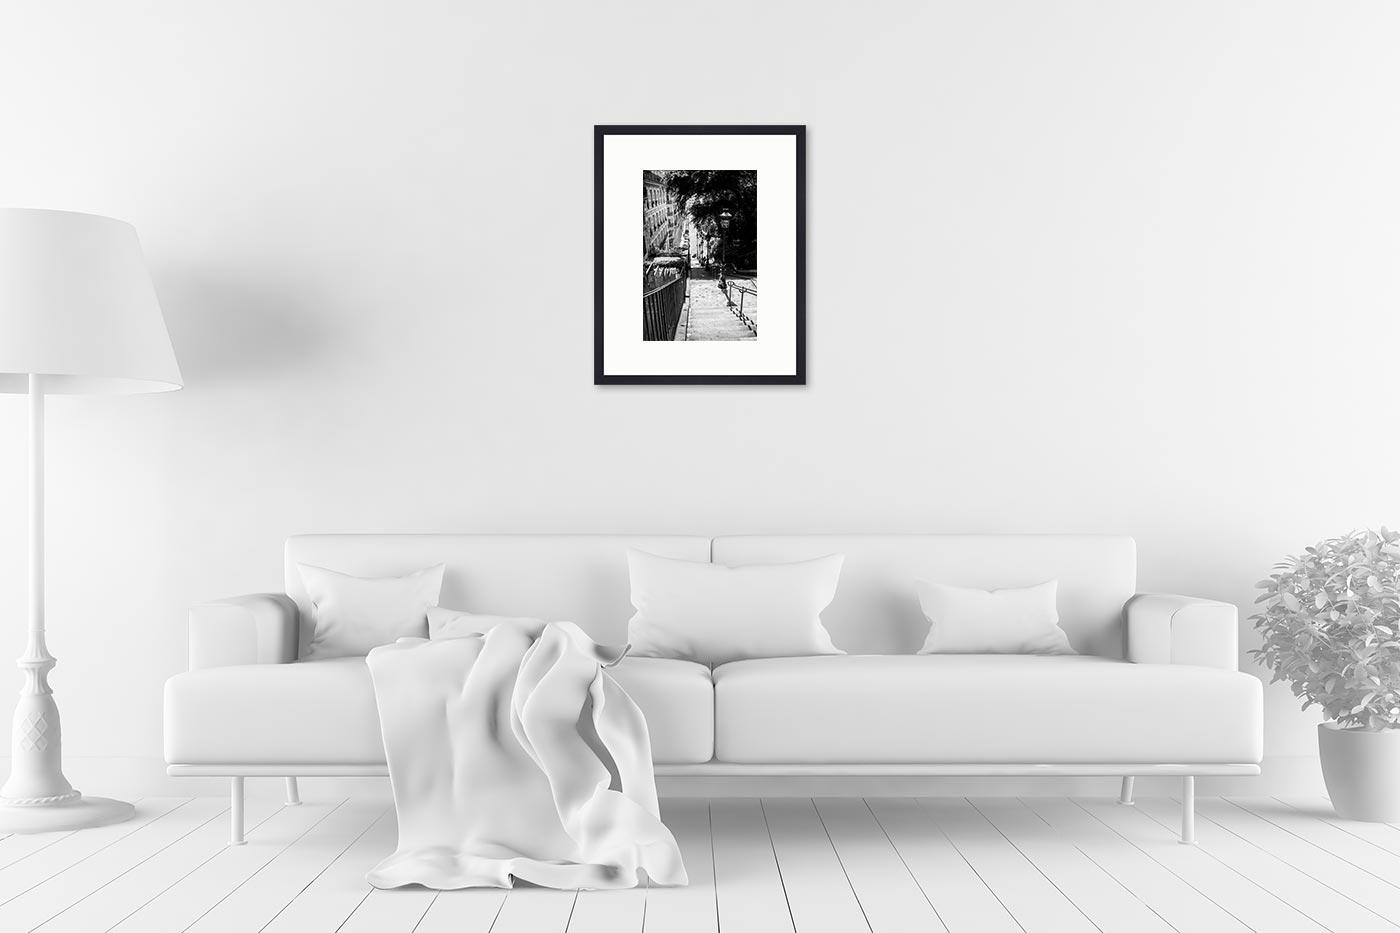 Cadre galerie 40x50 Montmartre